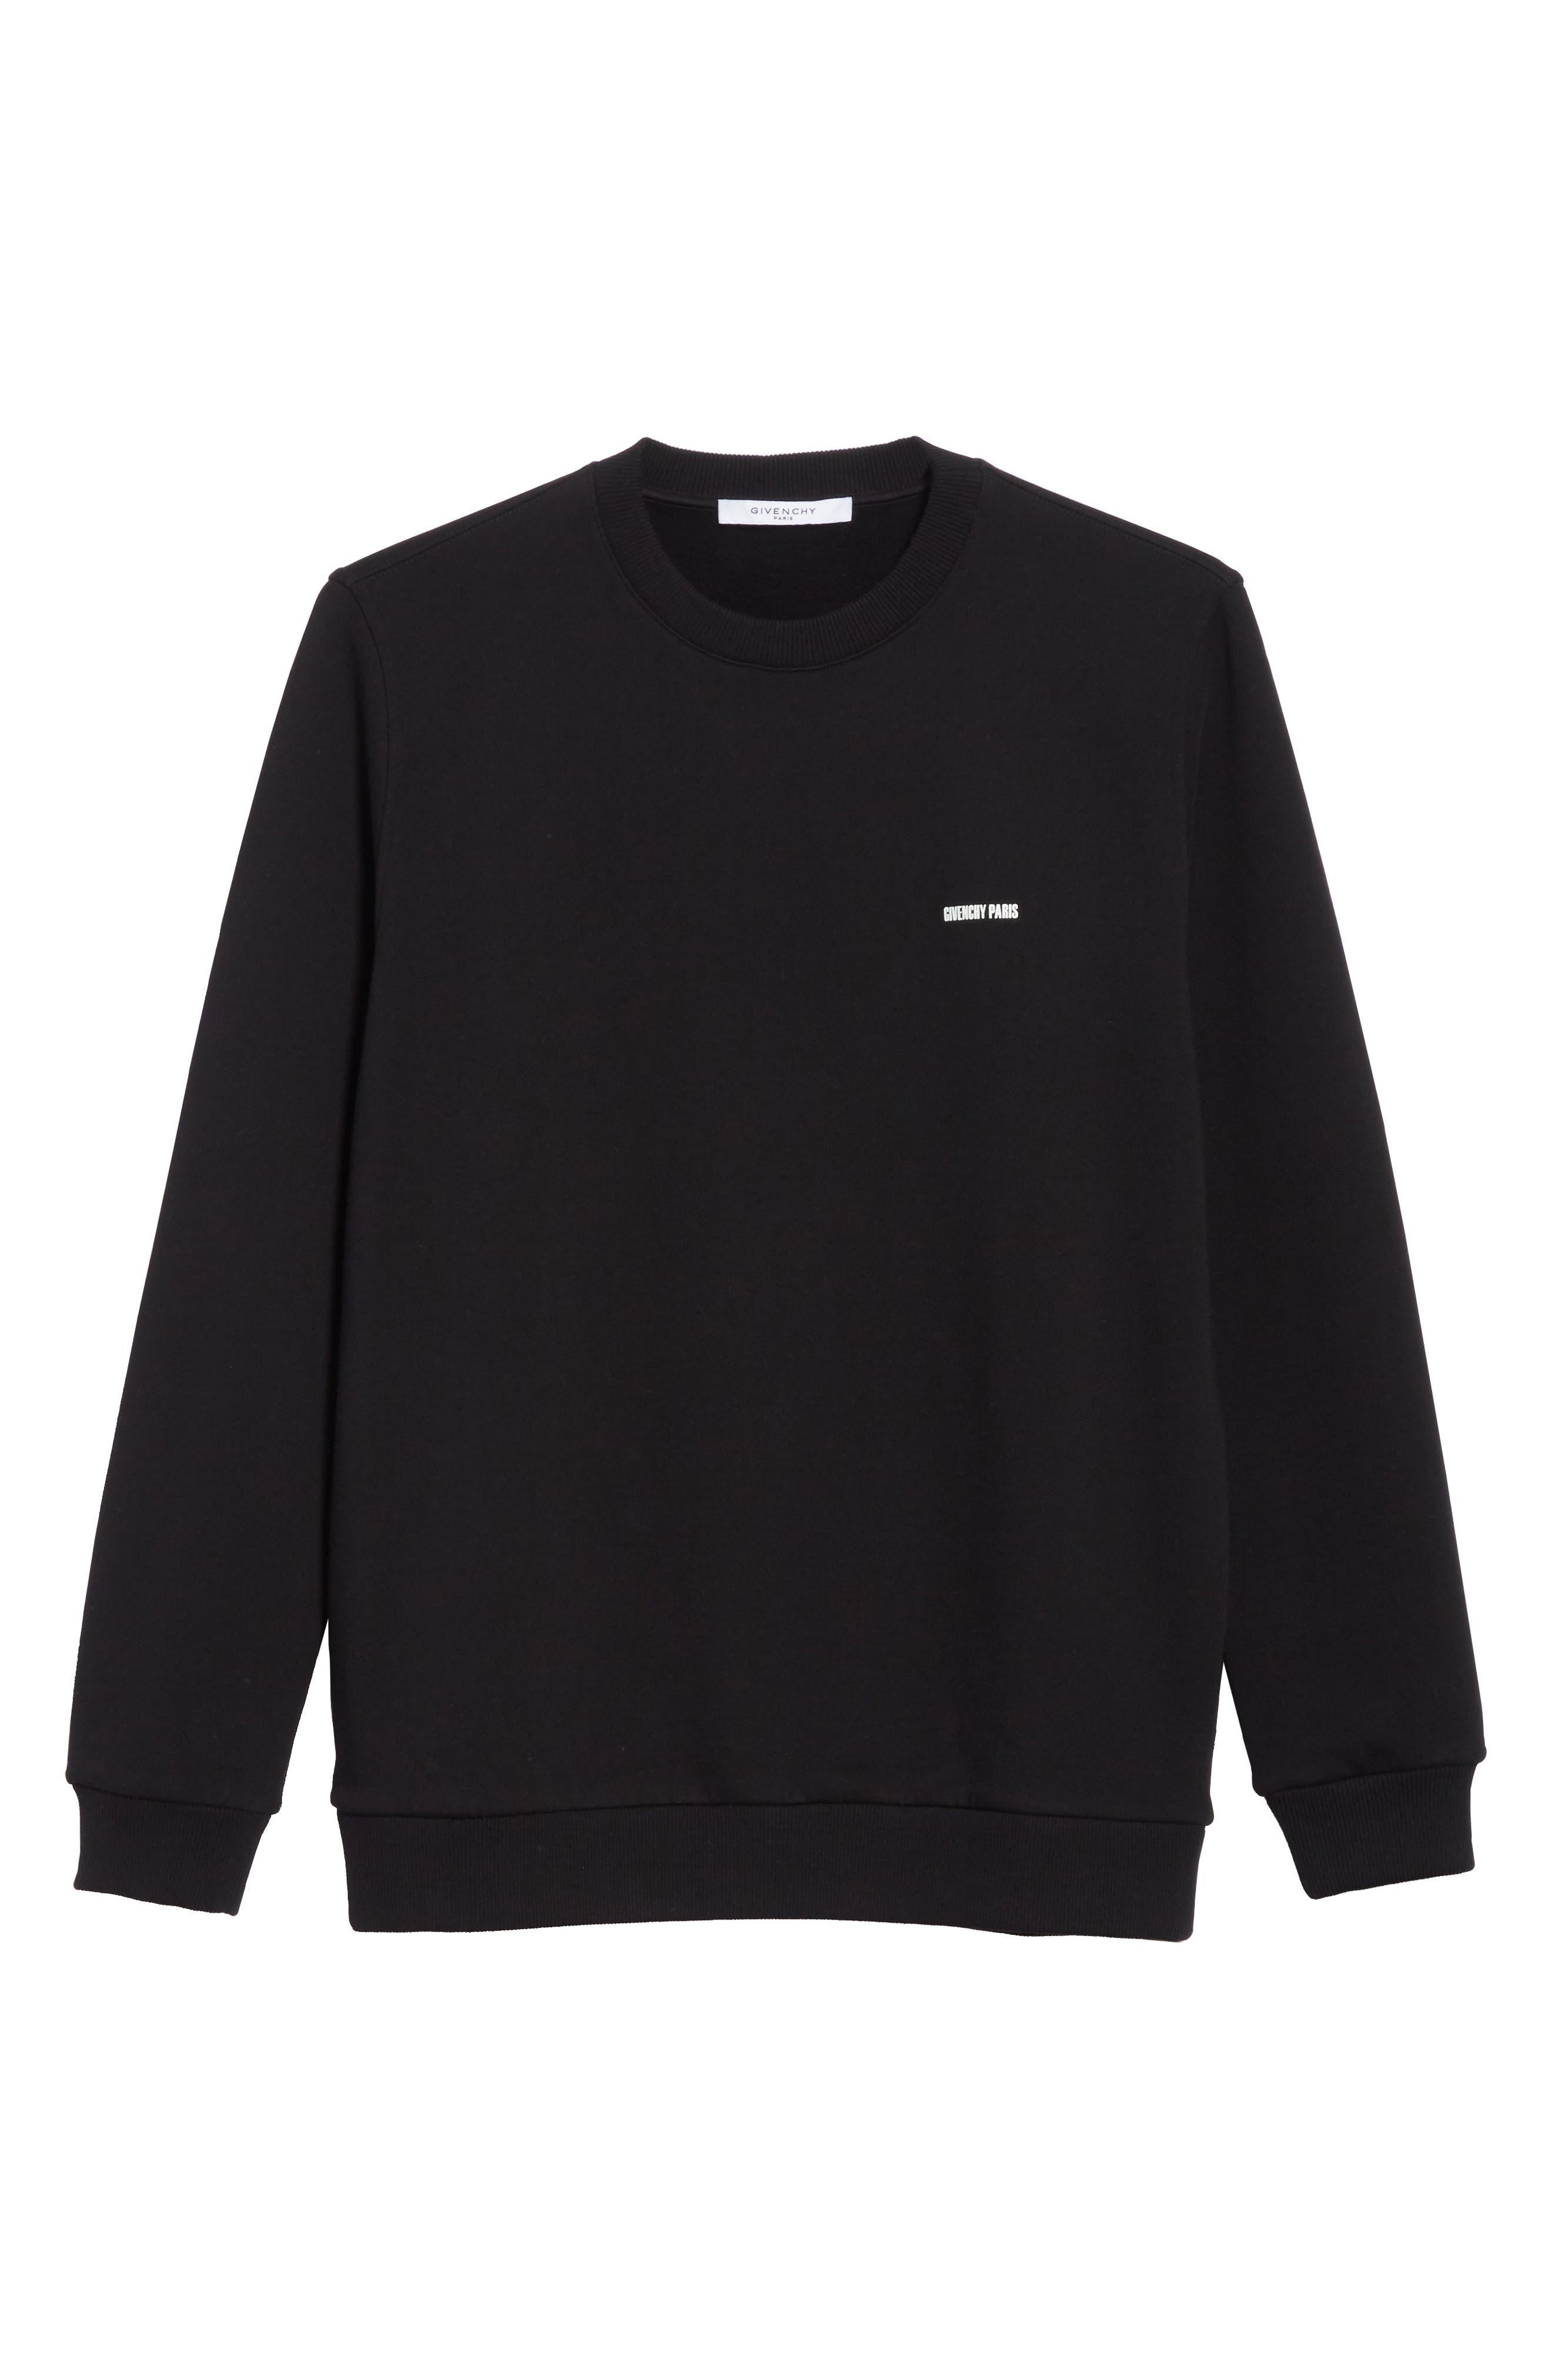 Original Crewneck Sweatshirt,                             Main thumbnail 1, color,                             Black